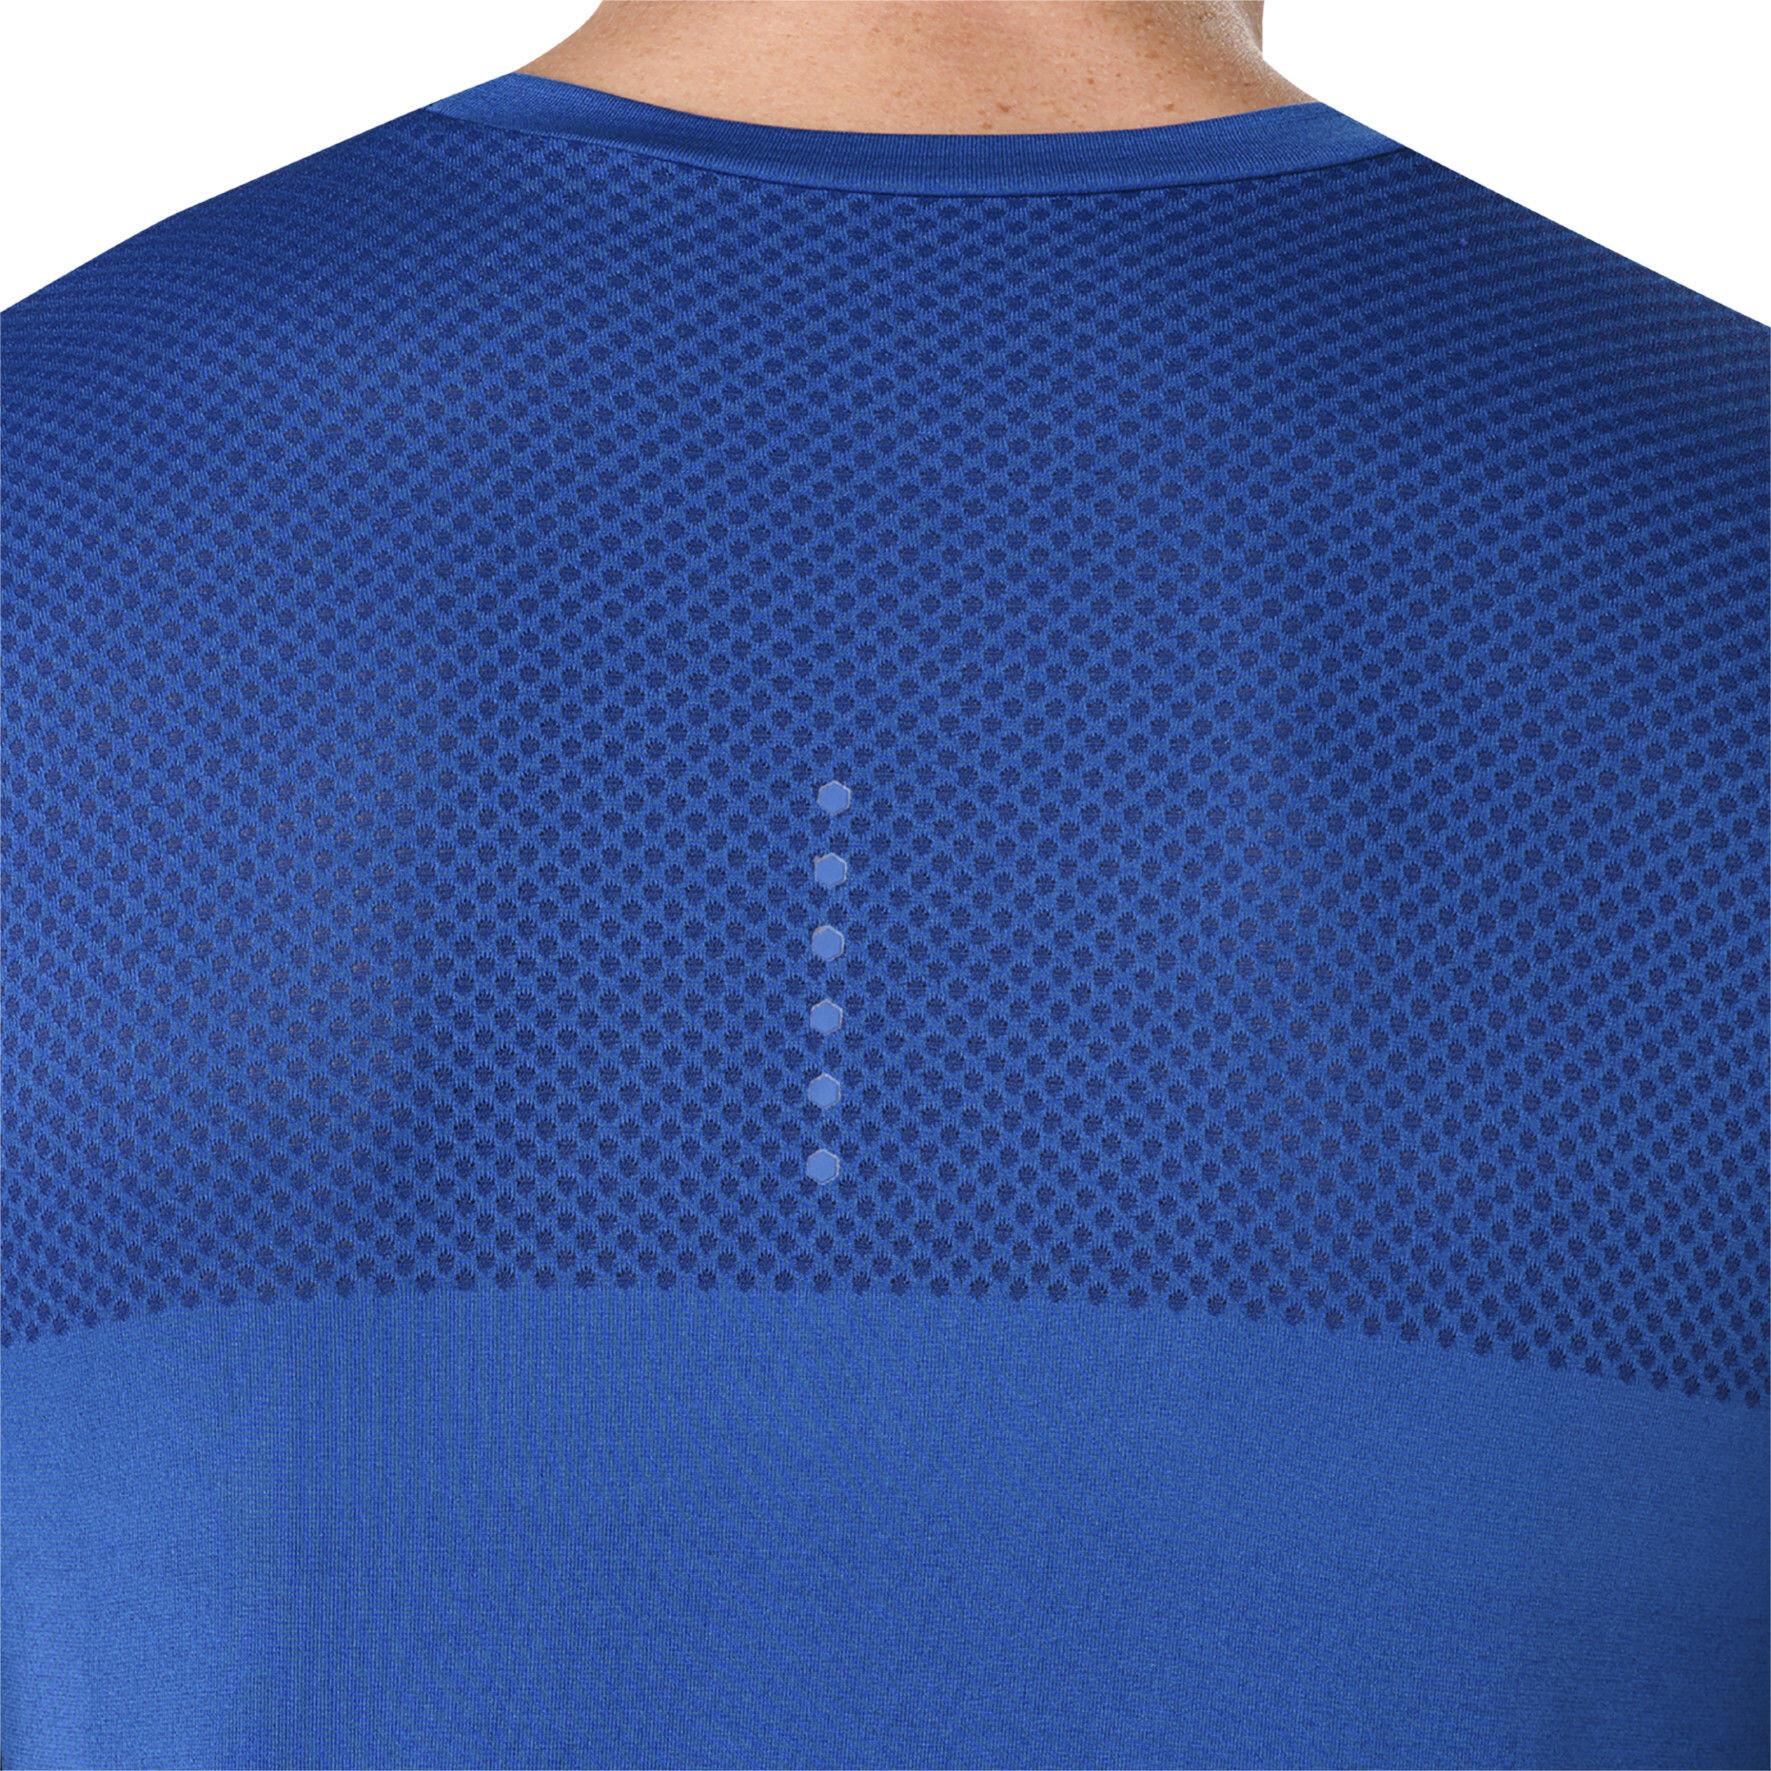 d31c346f3d87 asics fuzeX Seamless Running T-shirt Men blue at Bikester.co.uk